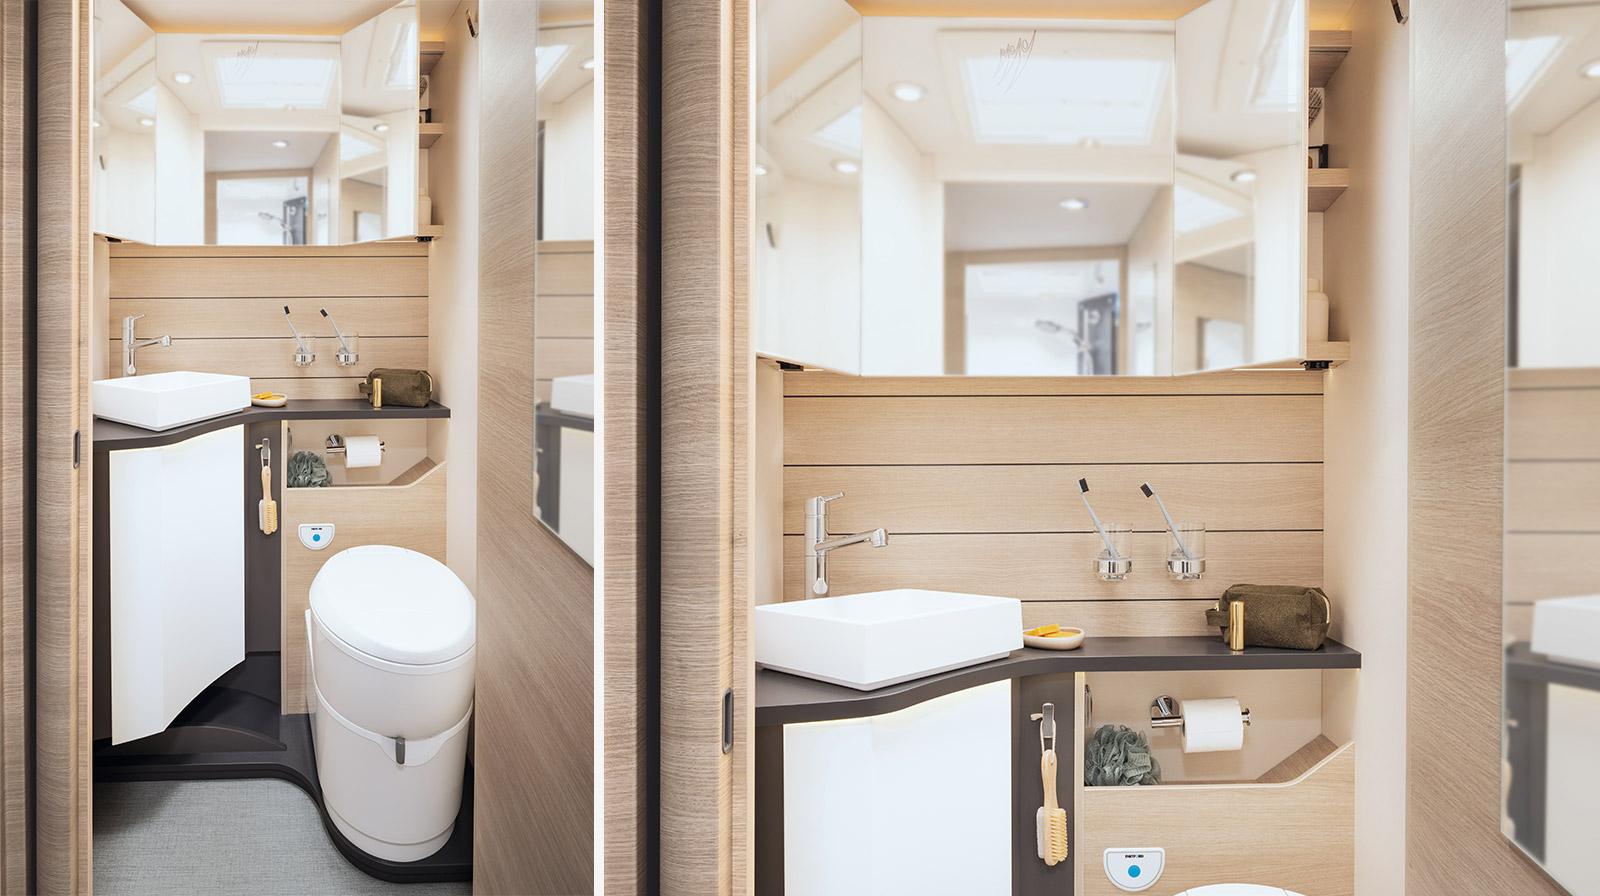 reisemobil rapido 666f teilintegrierte s rie 6f deutschland. Black Bedroom Furniture Sets. Home Design Ideas